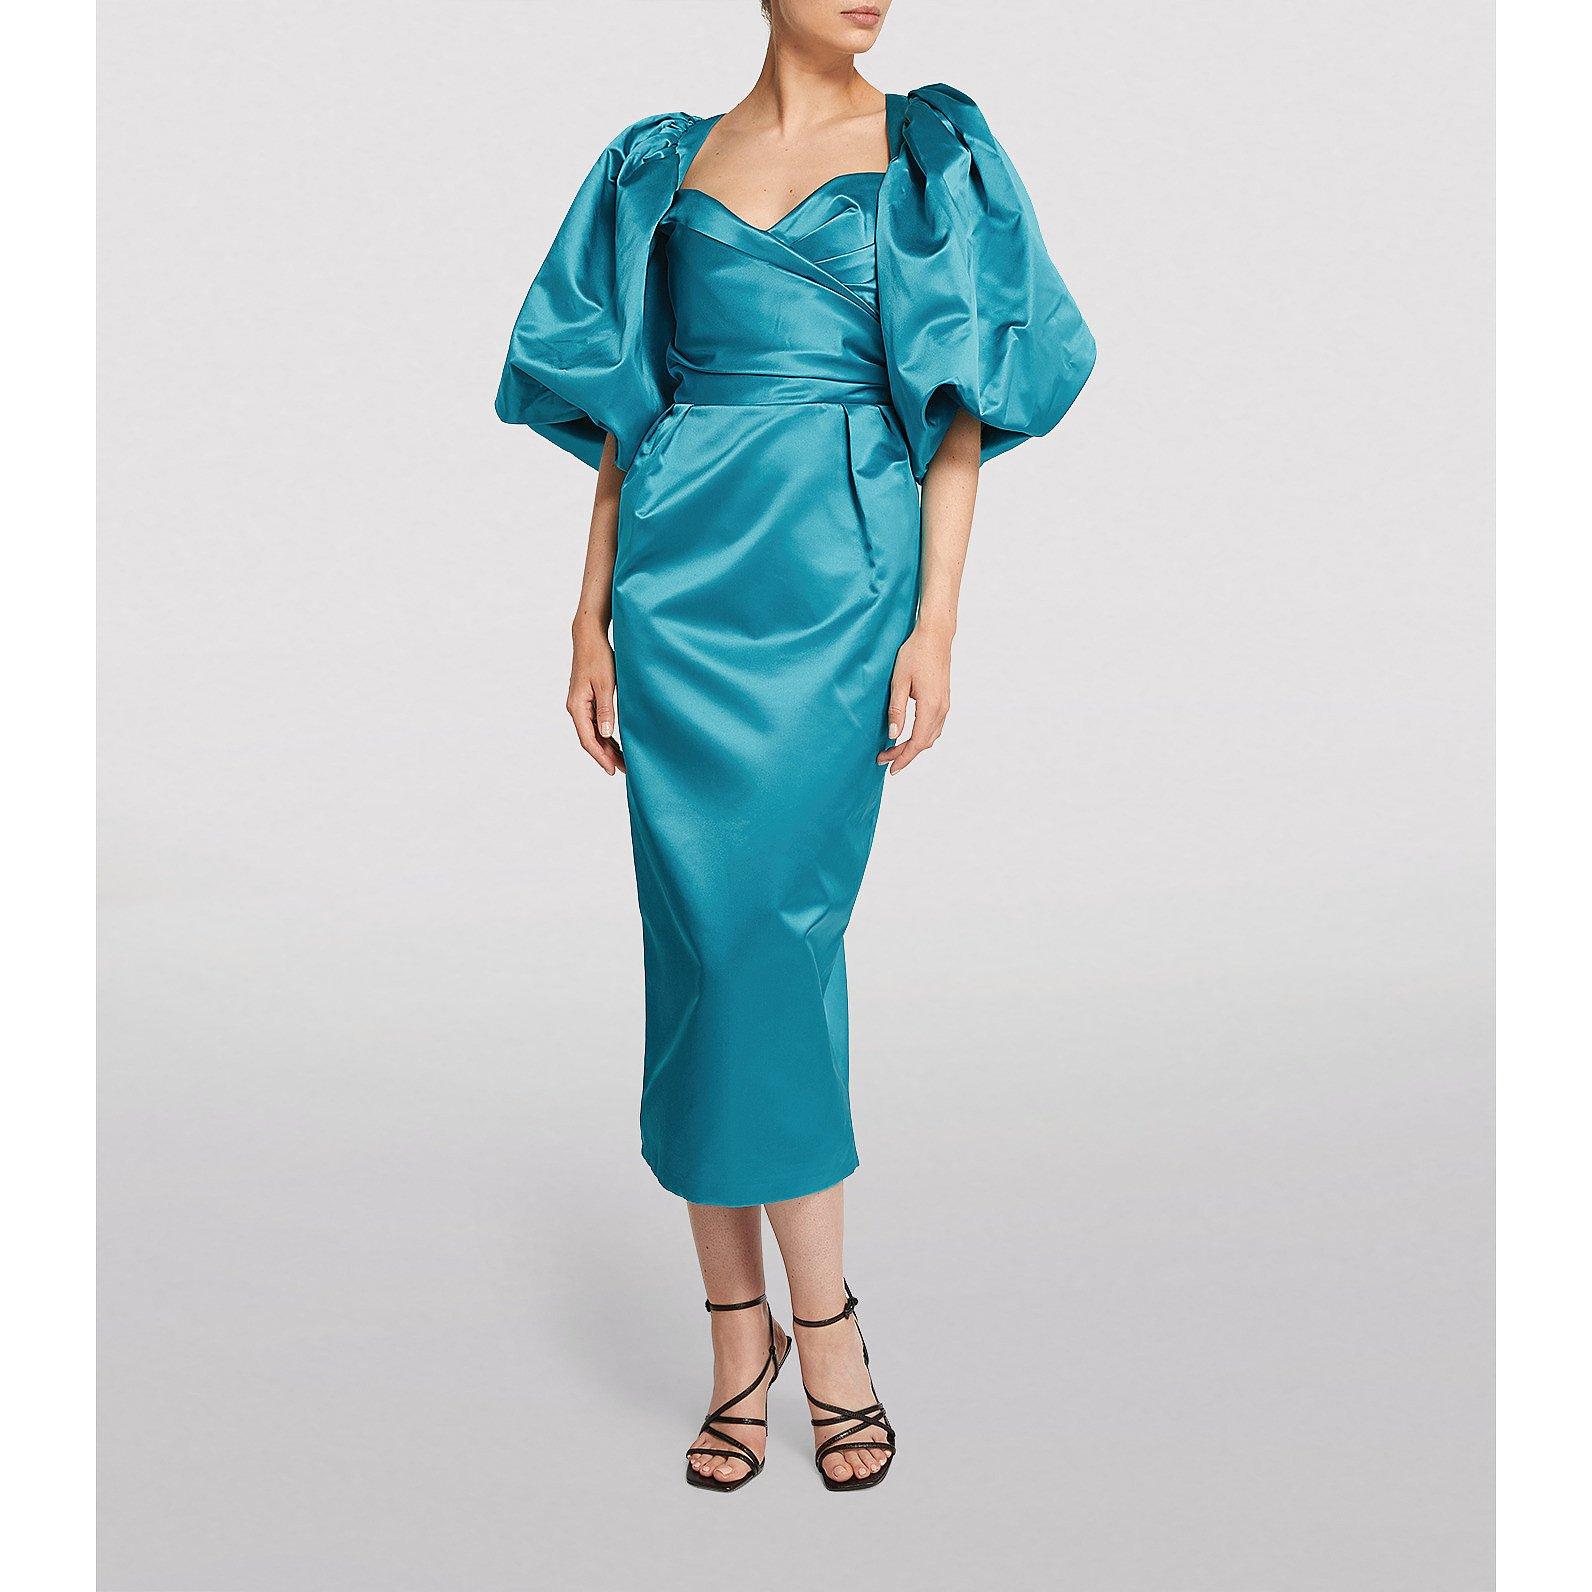 Rasario Satin Puff-Sleeved Midi Dress